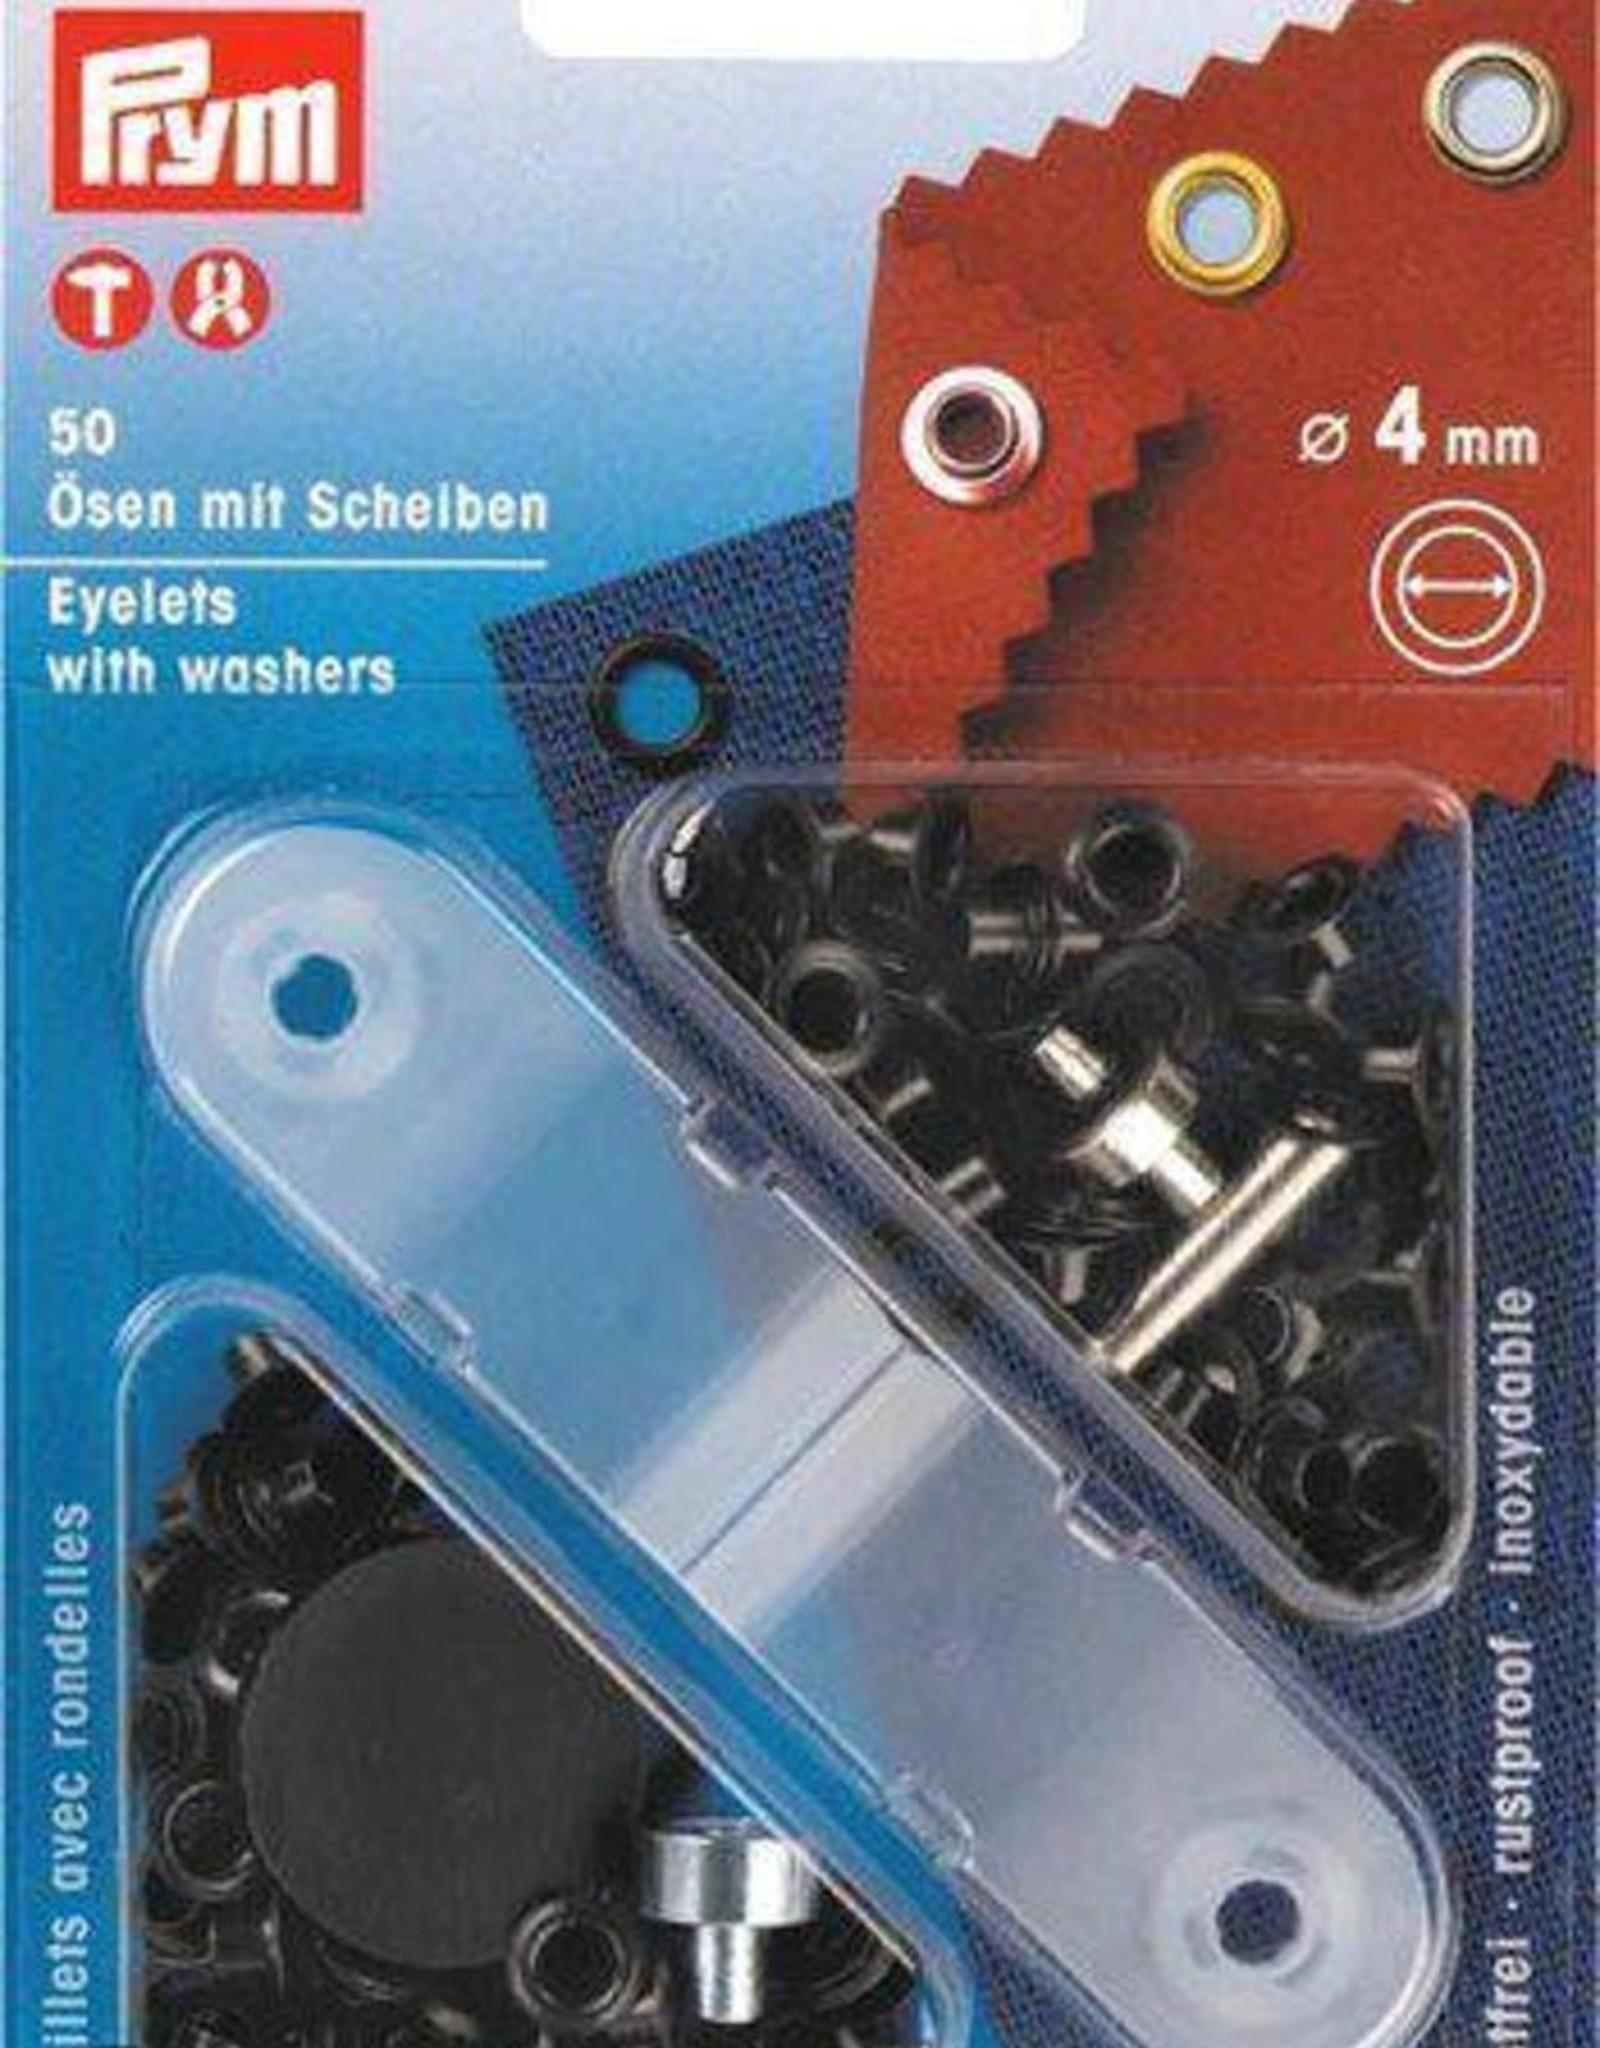 Prym Prym Ringen/Schijven 4mm 542 409